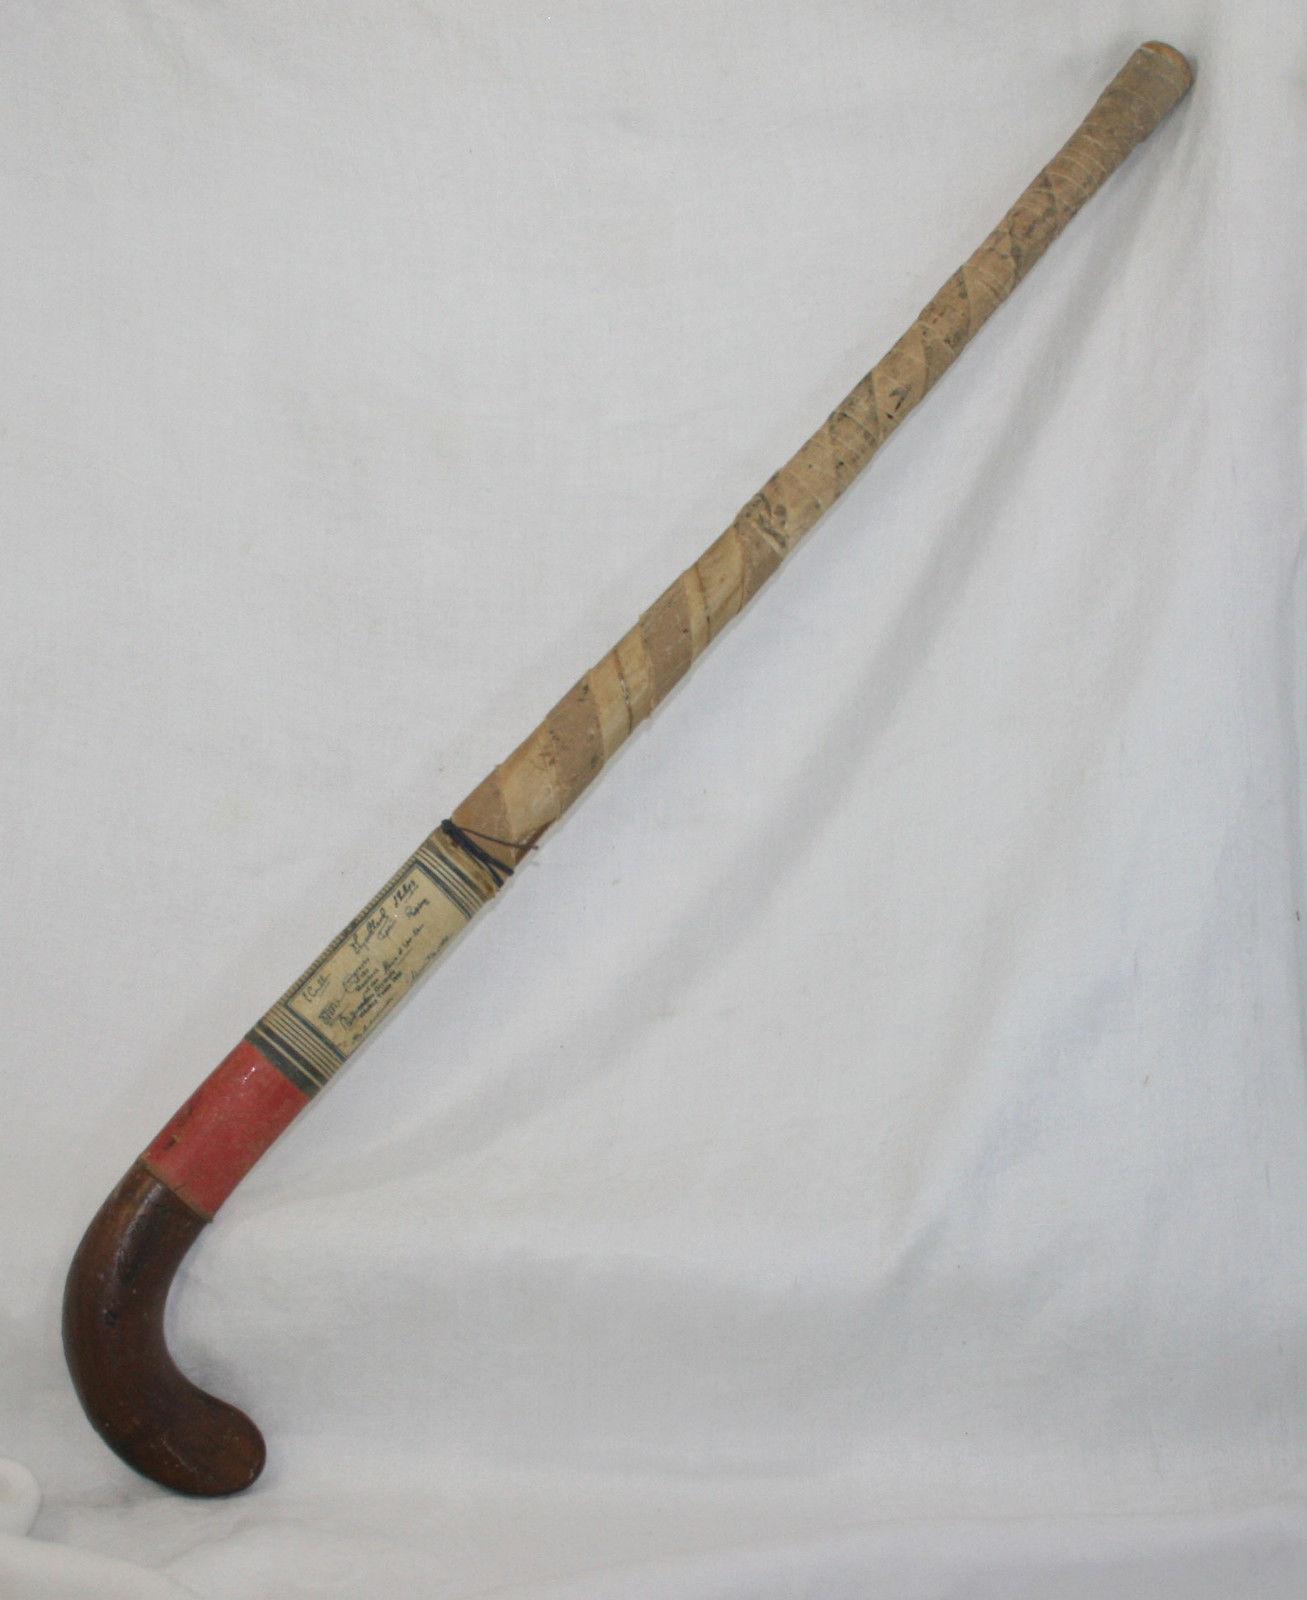 Hockey Stick Brands: Antique Field Hockey Stick - Bulldog Brand - 1936